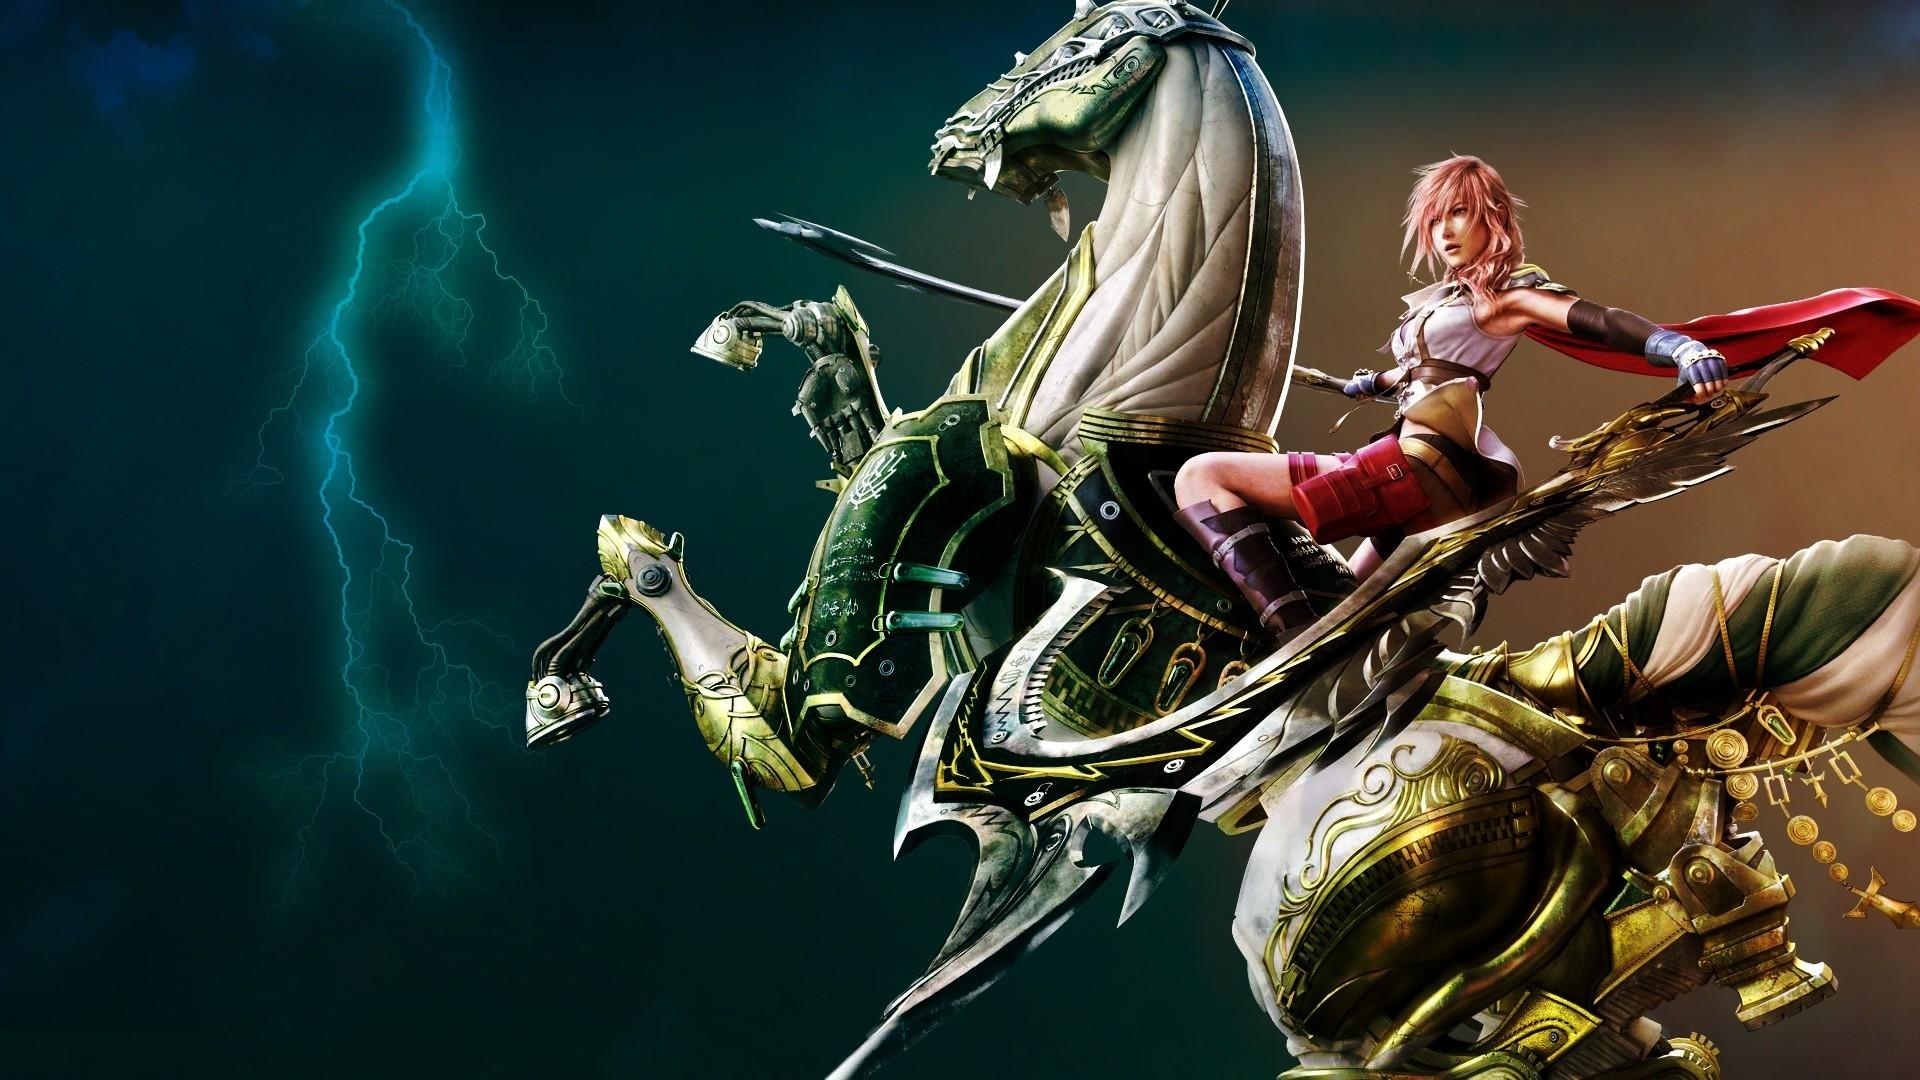 Final Fantasy Wallpaper Hd